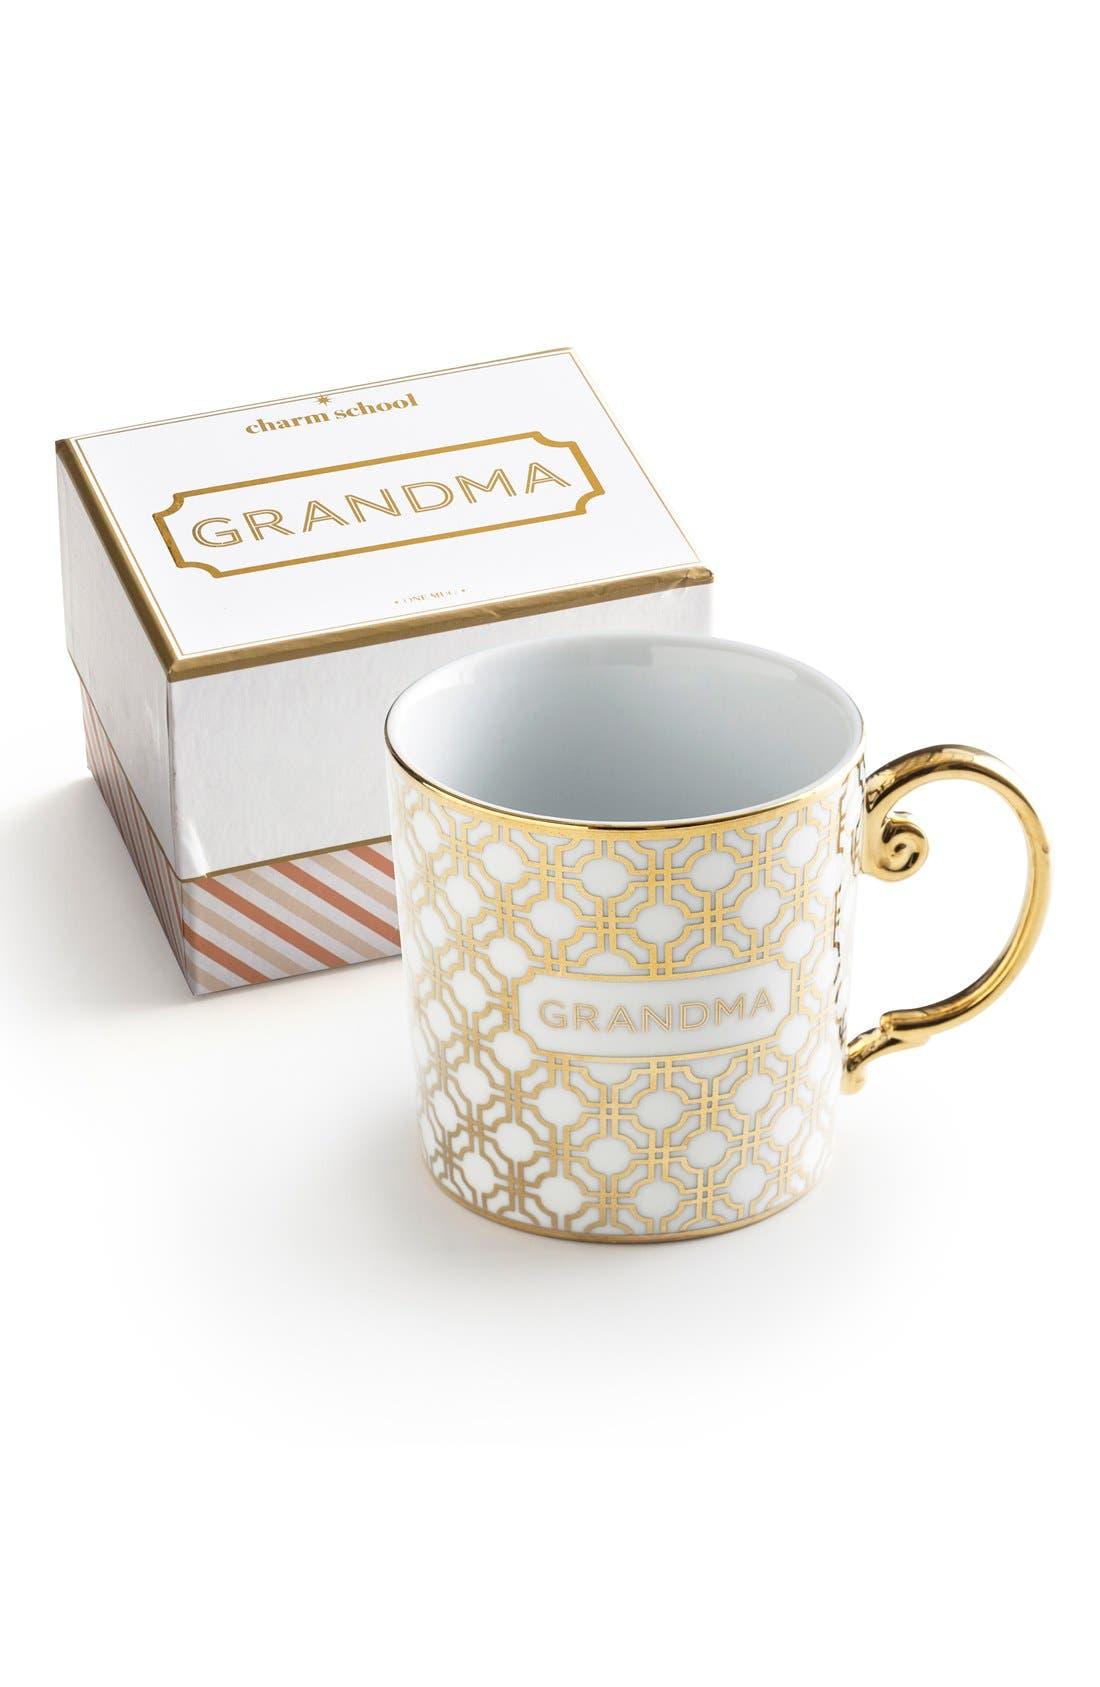 Main Image - Rosanna 'Grandma' Porcelain Coffee Mug